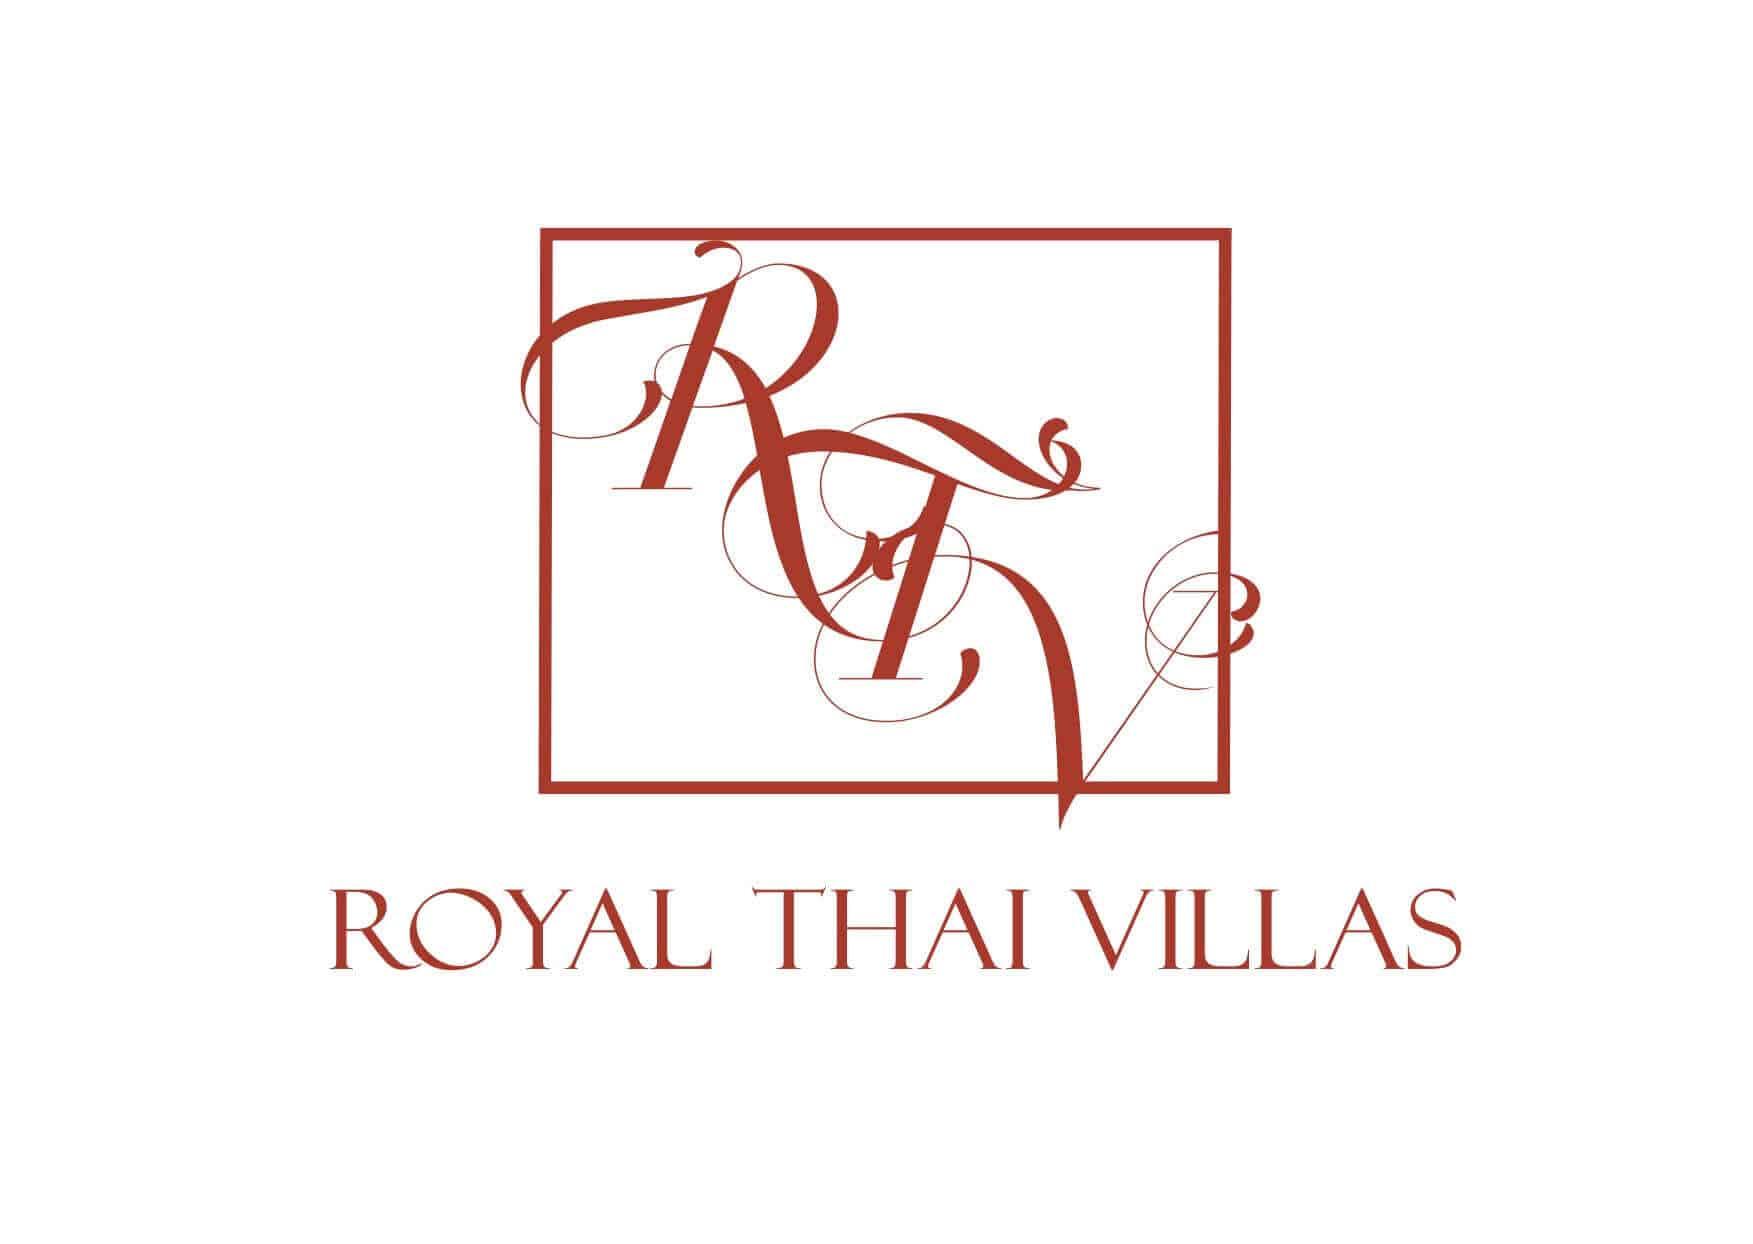 Royal-thai-villas-logo